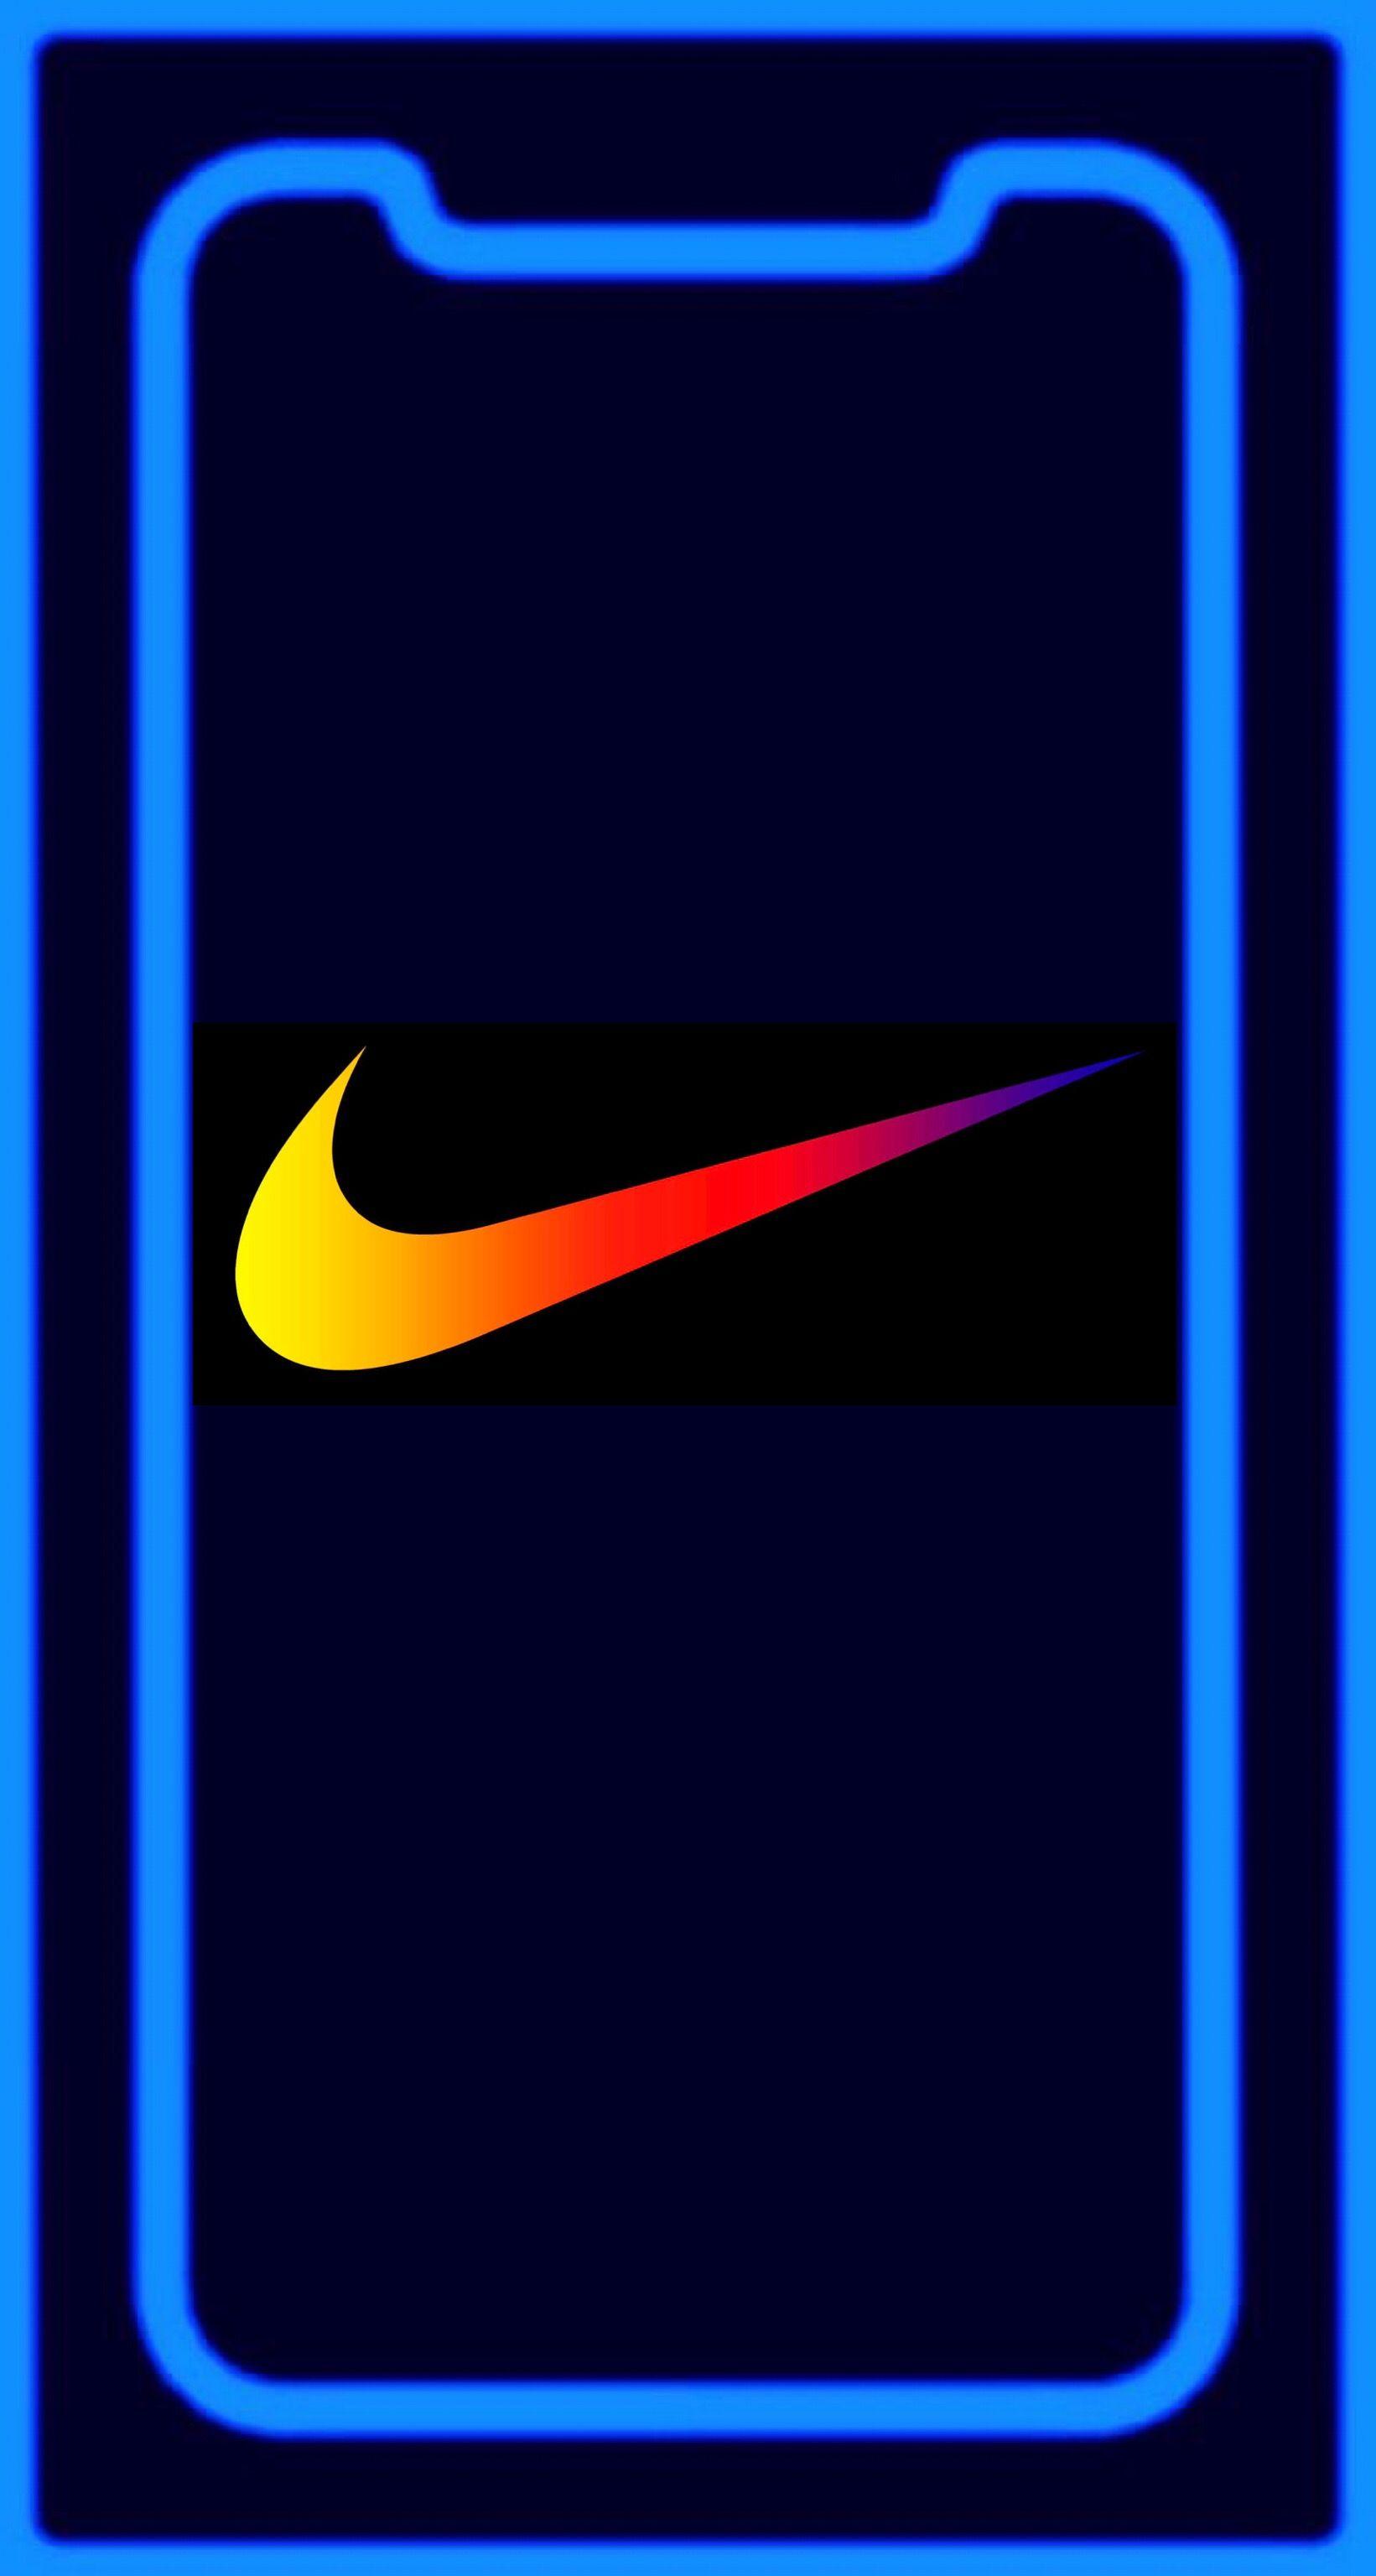 Wallpaper Iphone X Nike Colour In 2019 Apple Wallpaper